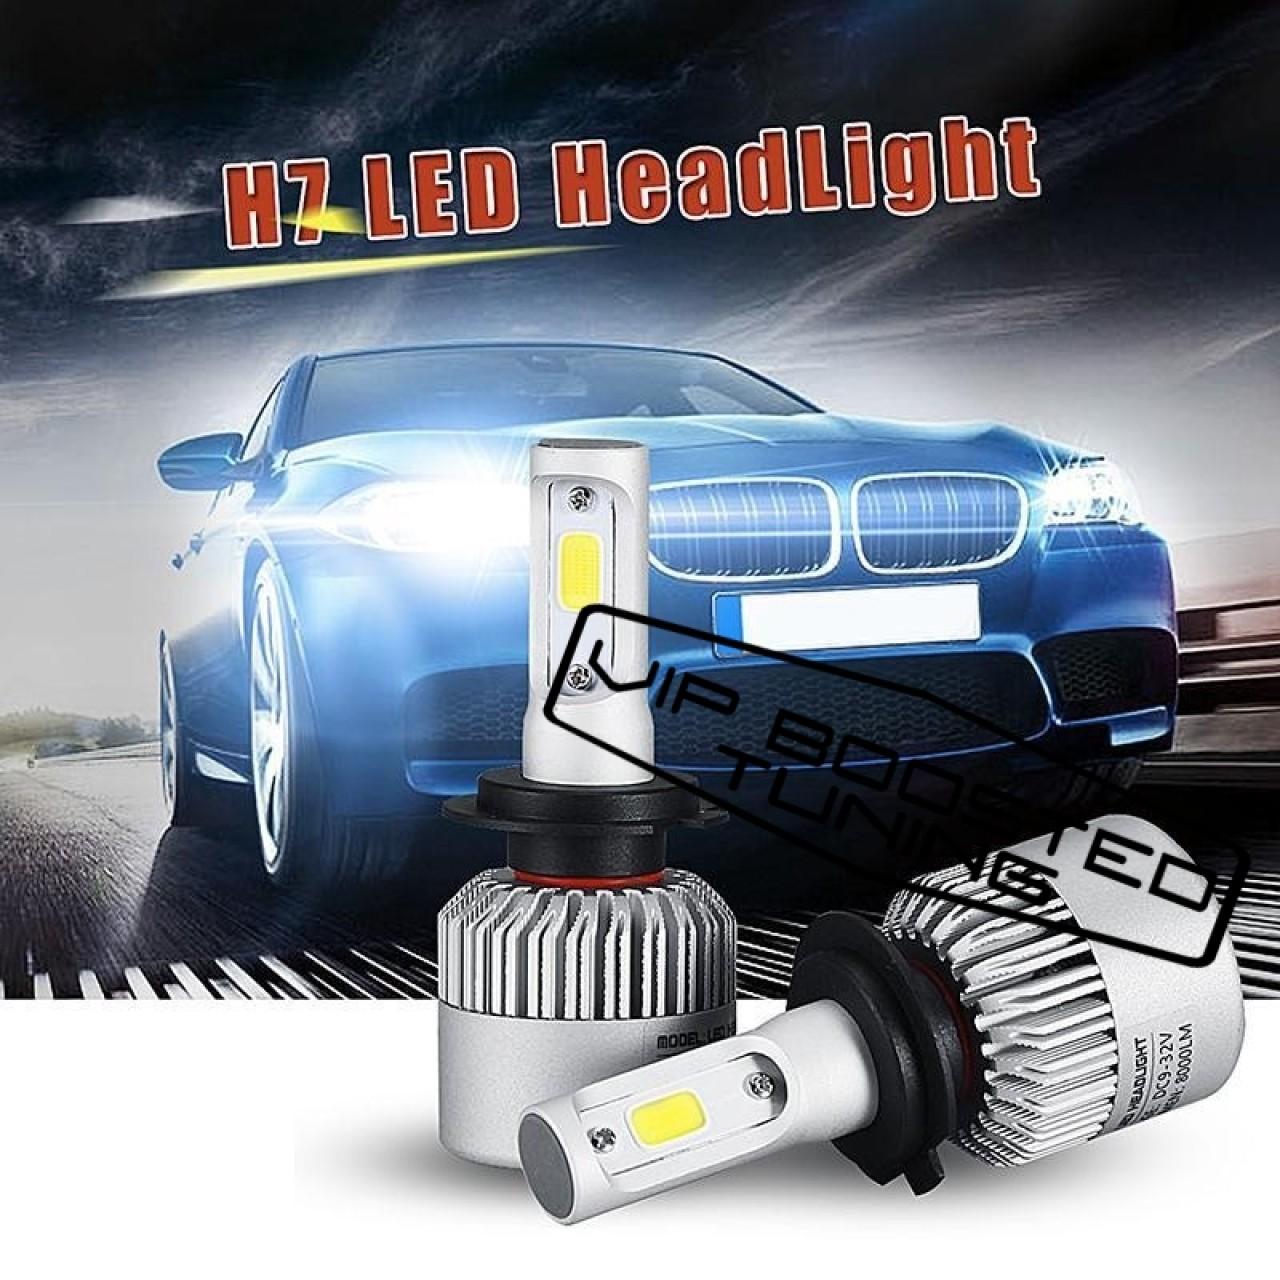 Set 2 leduri H7 Canbus pentru far auto putere 60W, luminozitate 4000 Lm, 12V